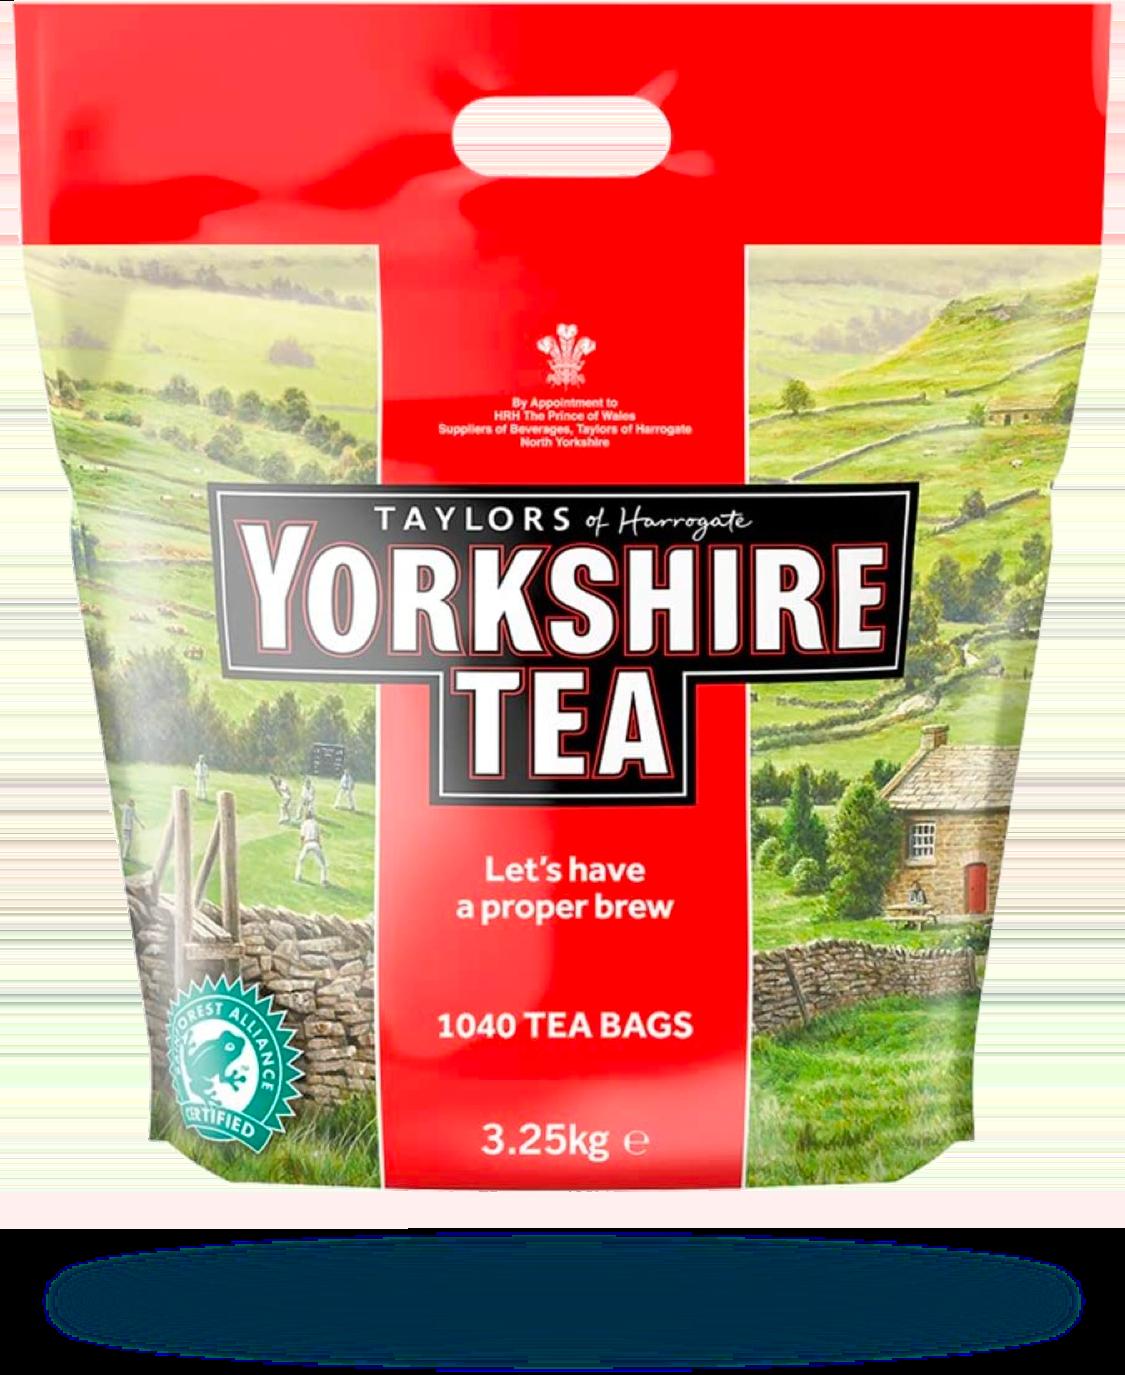 Tea - Yorkshire Tea 1040 Tea Bags